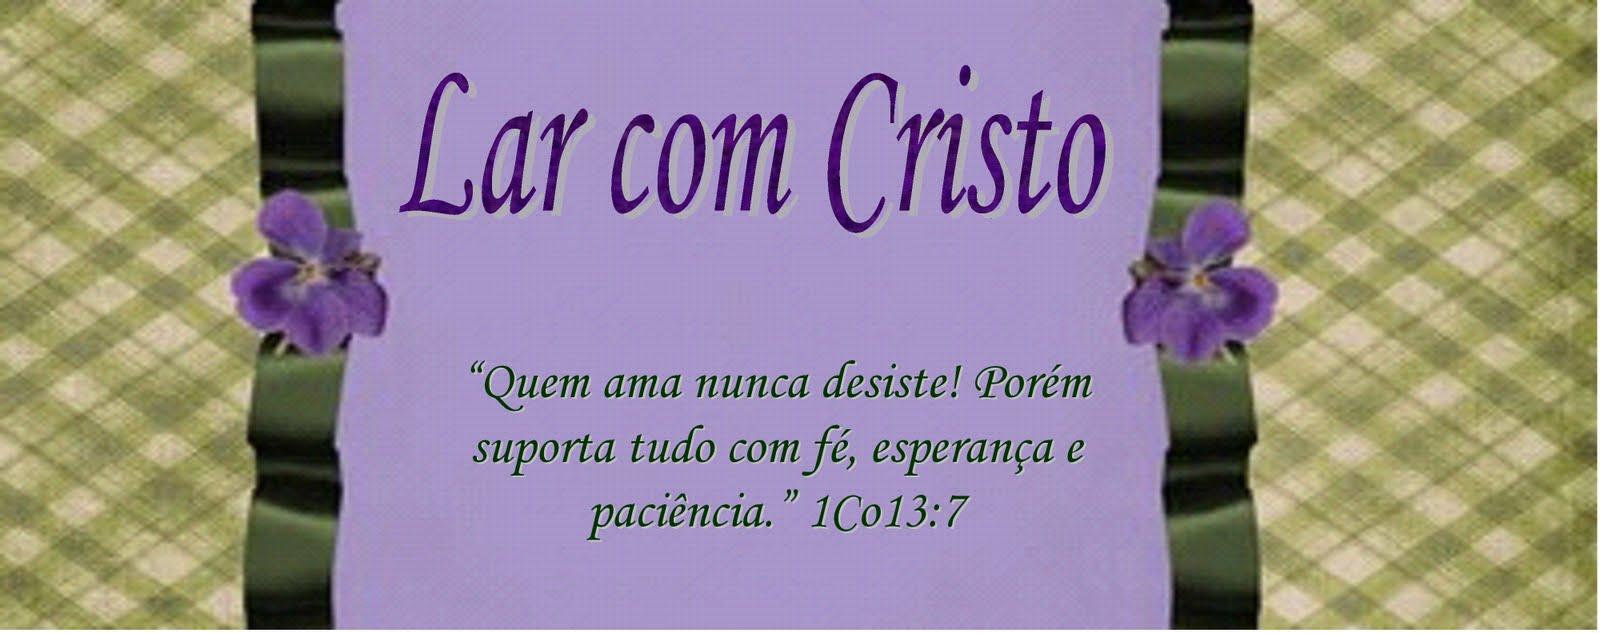 Lar com Cristo